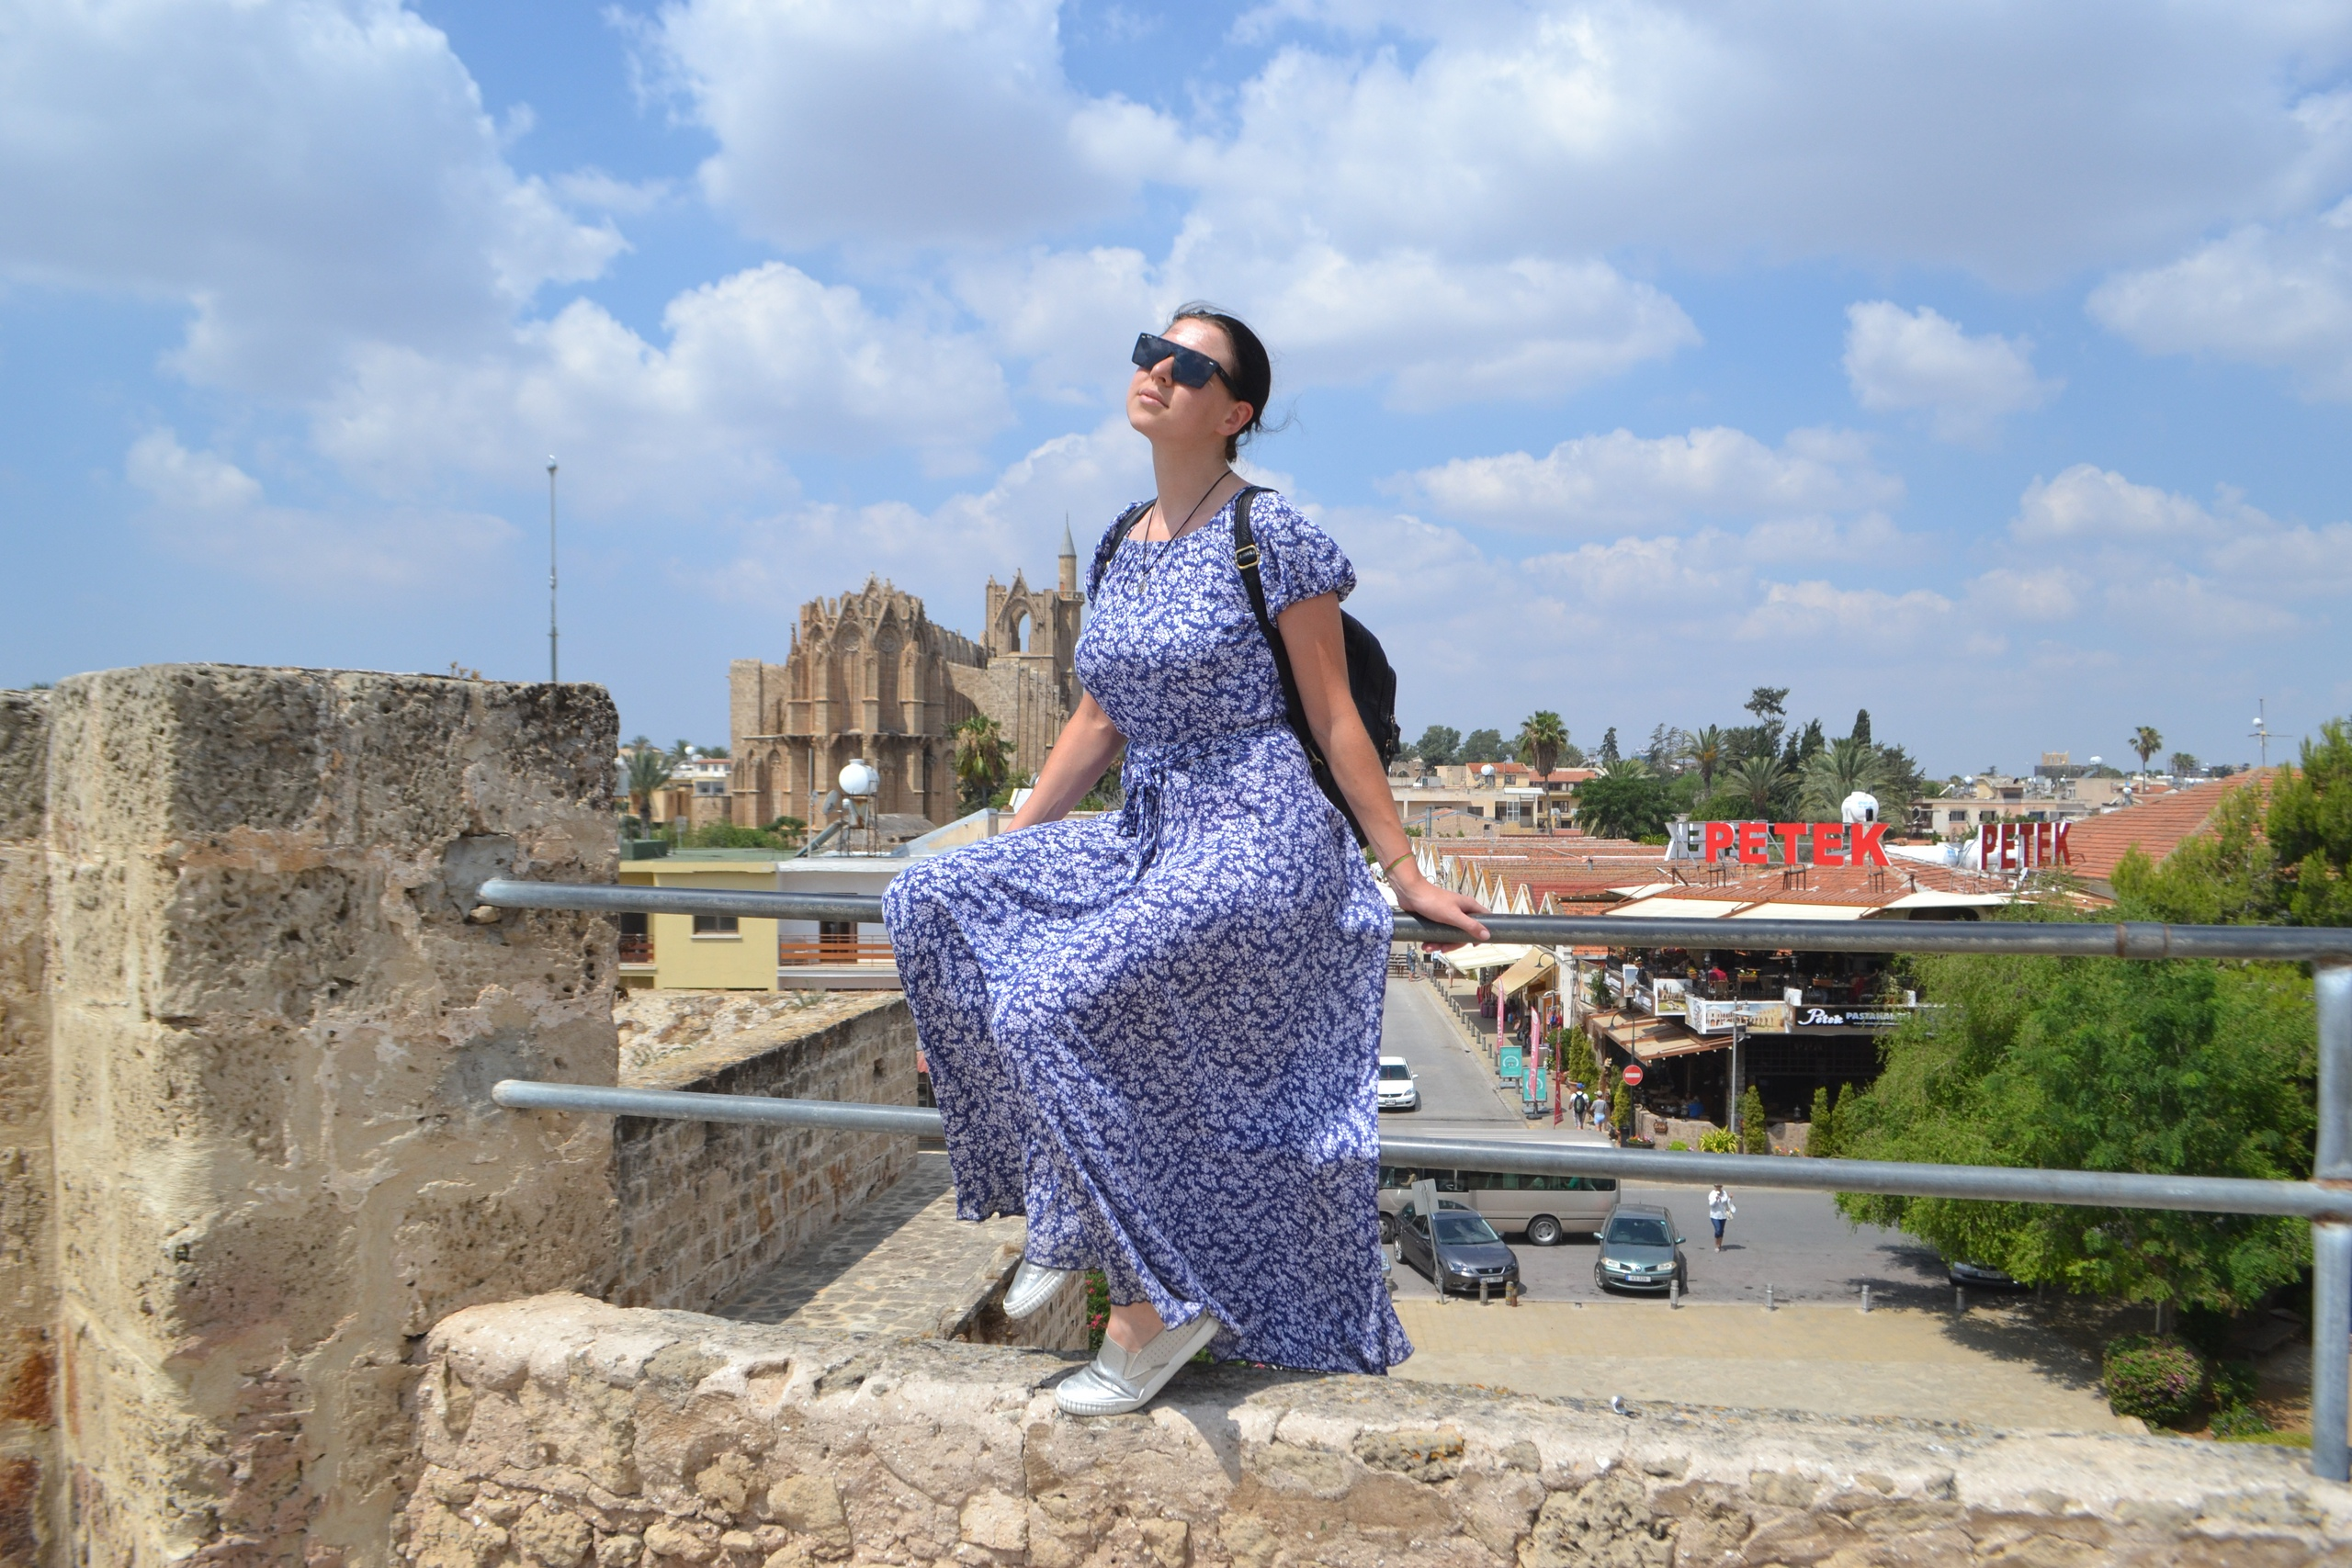 Елена Руденко (Валтея). Северный Кипр. Кериния и Фамагуста. (фото) - Страница 6 T5VGpAEr6MU